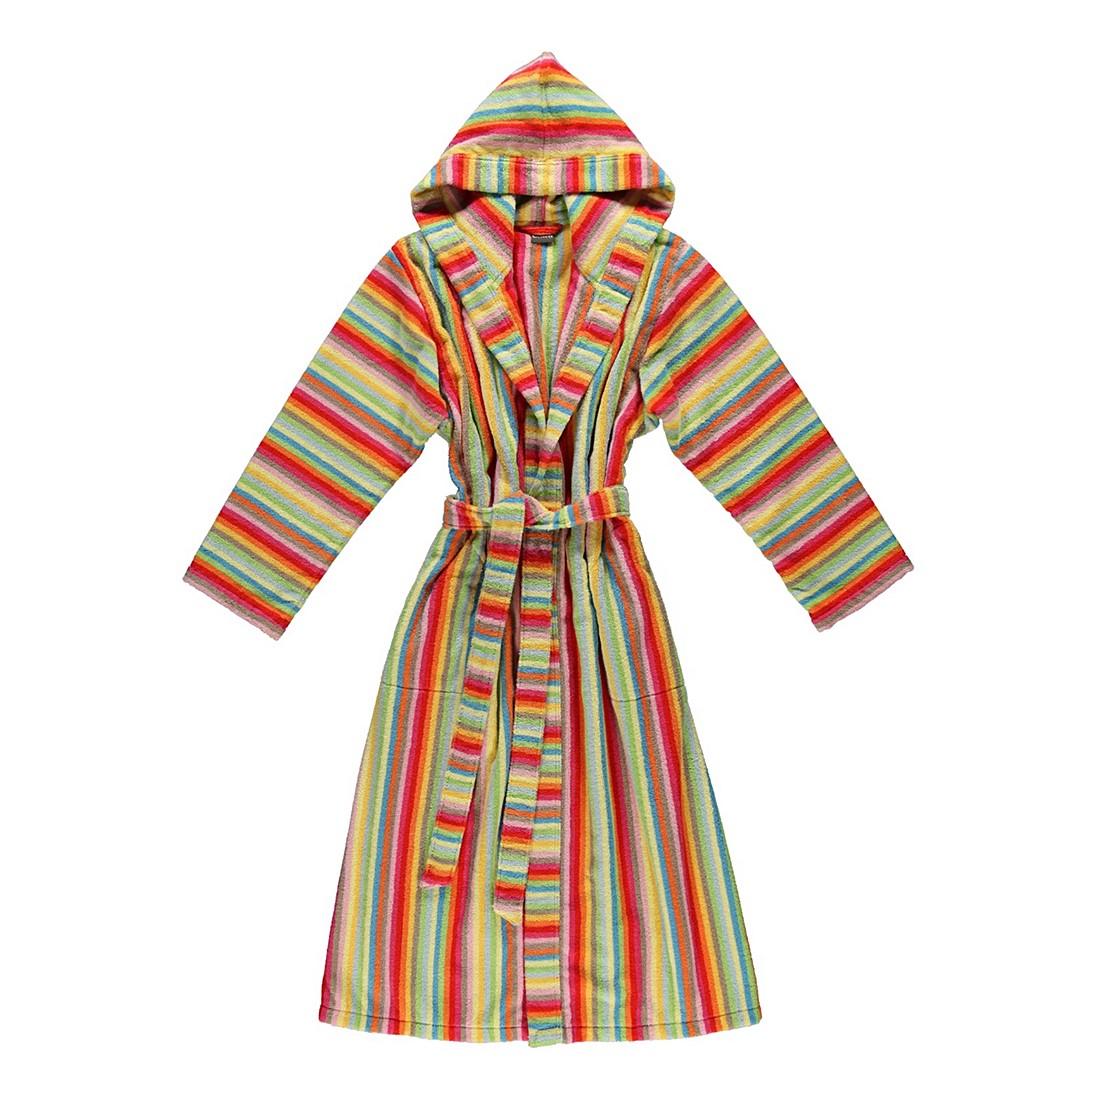 Bademantel Life Style 7081 – Damen – FRottier – 100% Baumwolle multicolor – 25 – Größe: M, Cawö jetzt bestellen